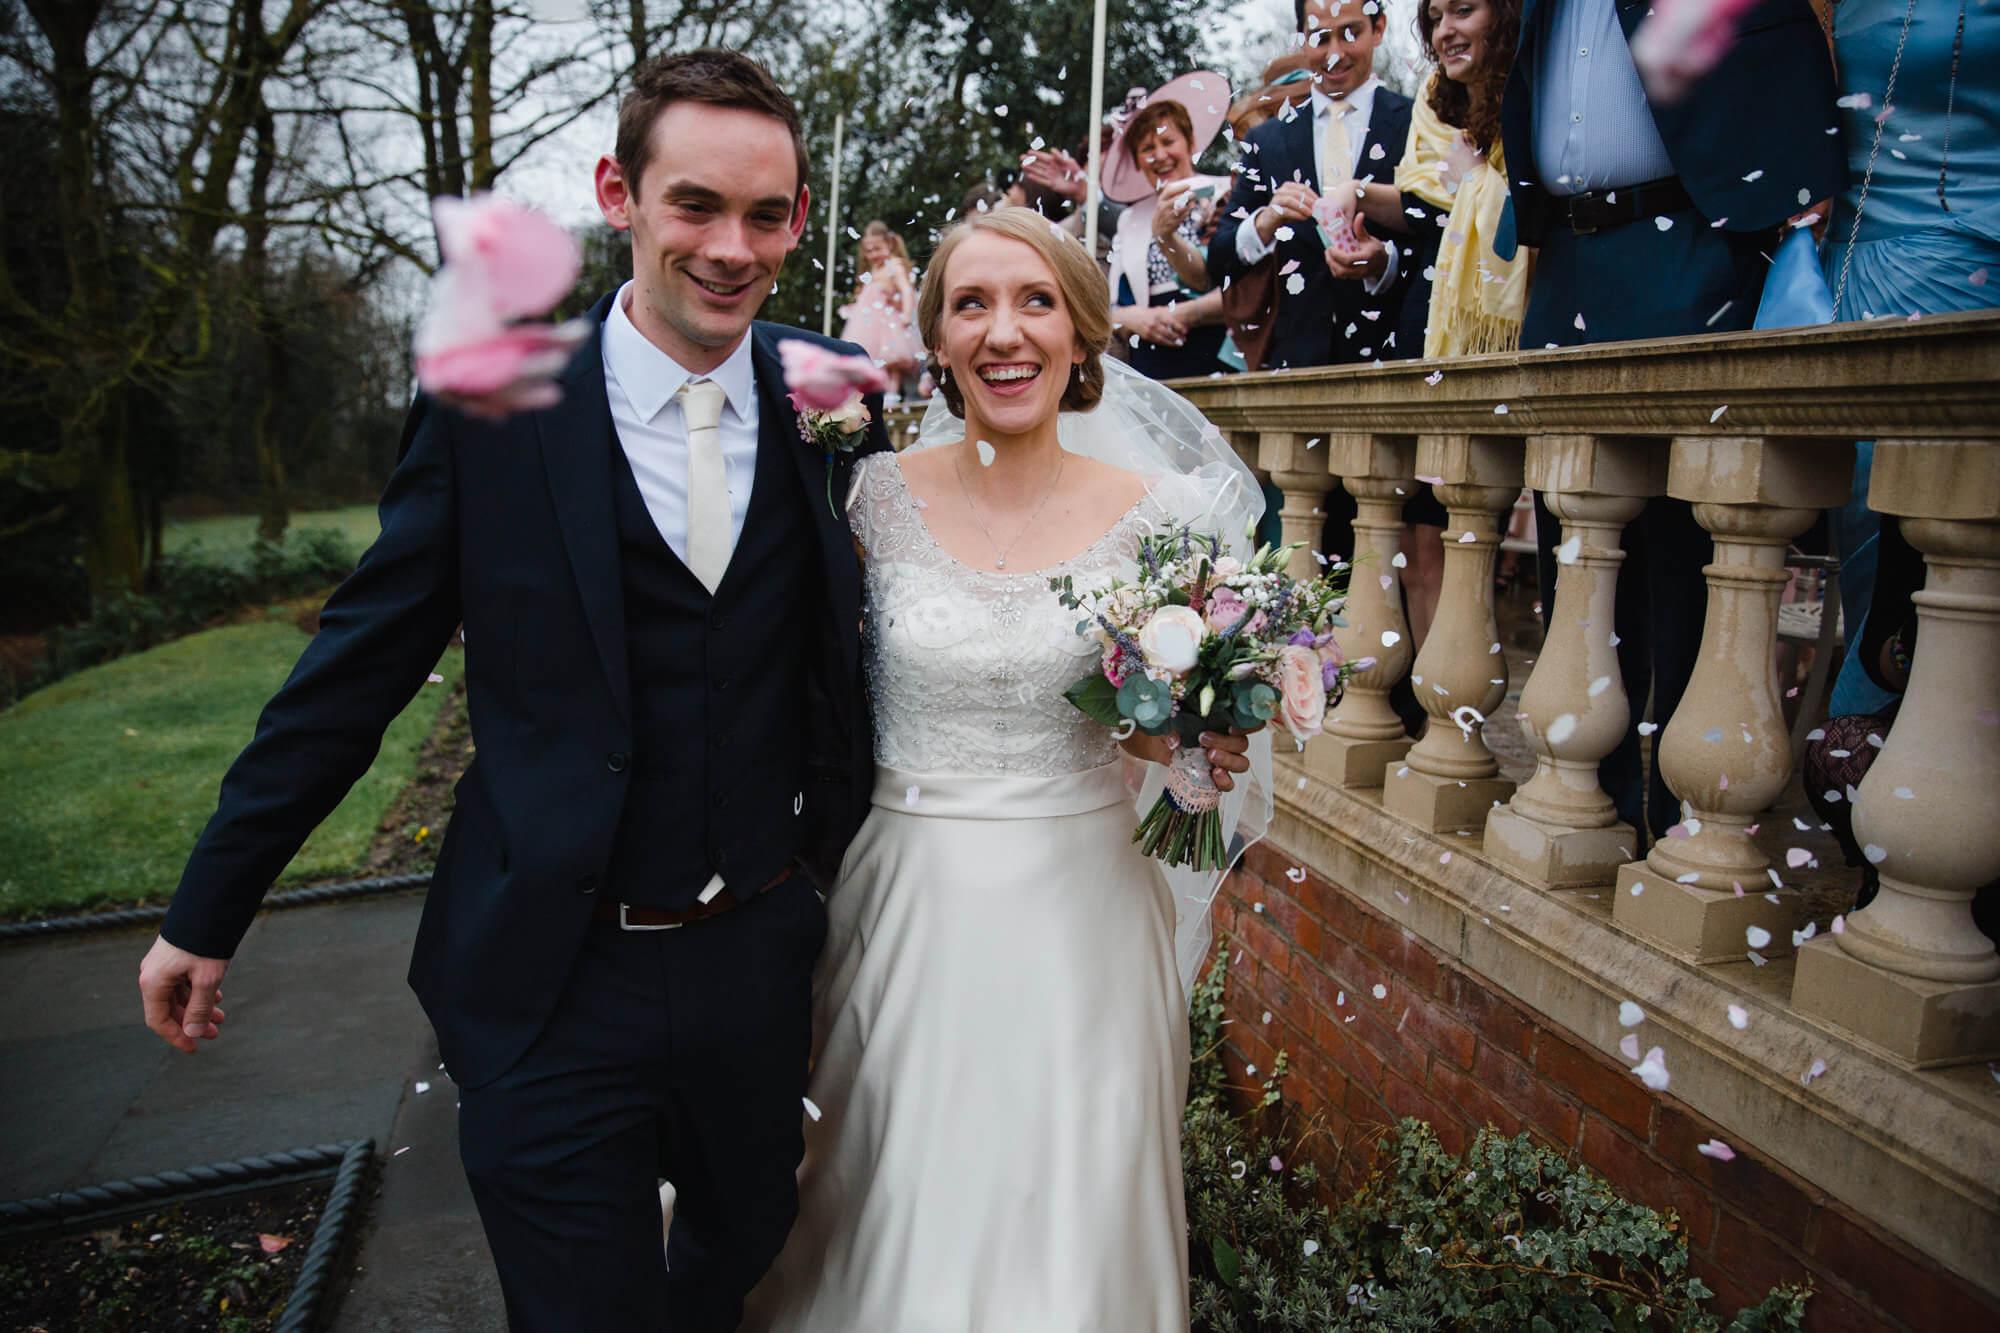 Manchester_Wedding_Photographer_011.jpg